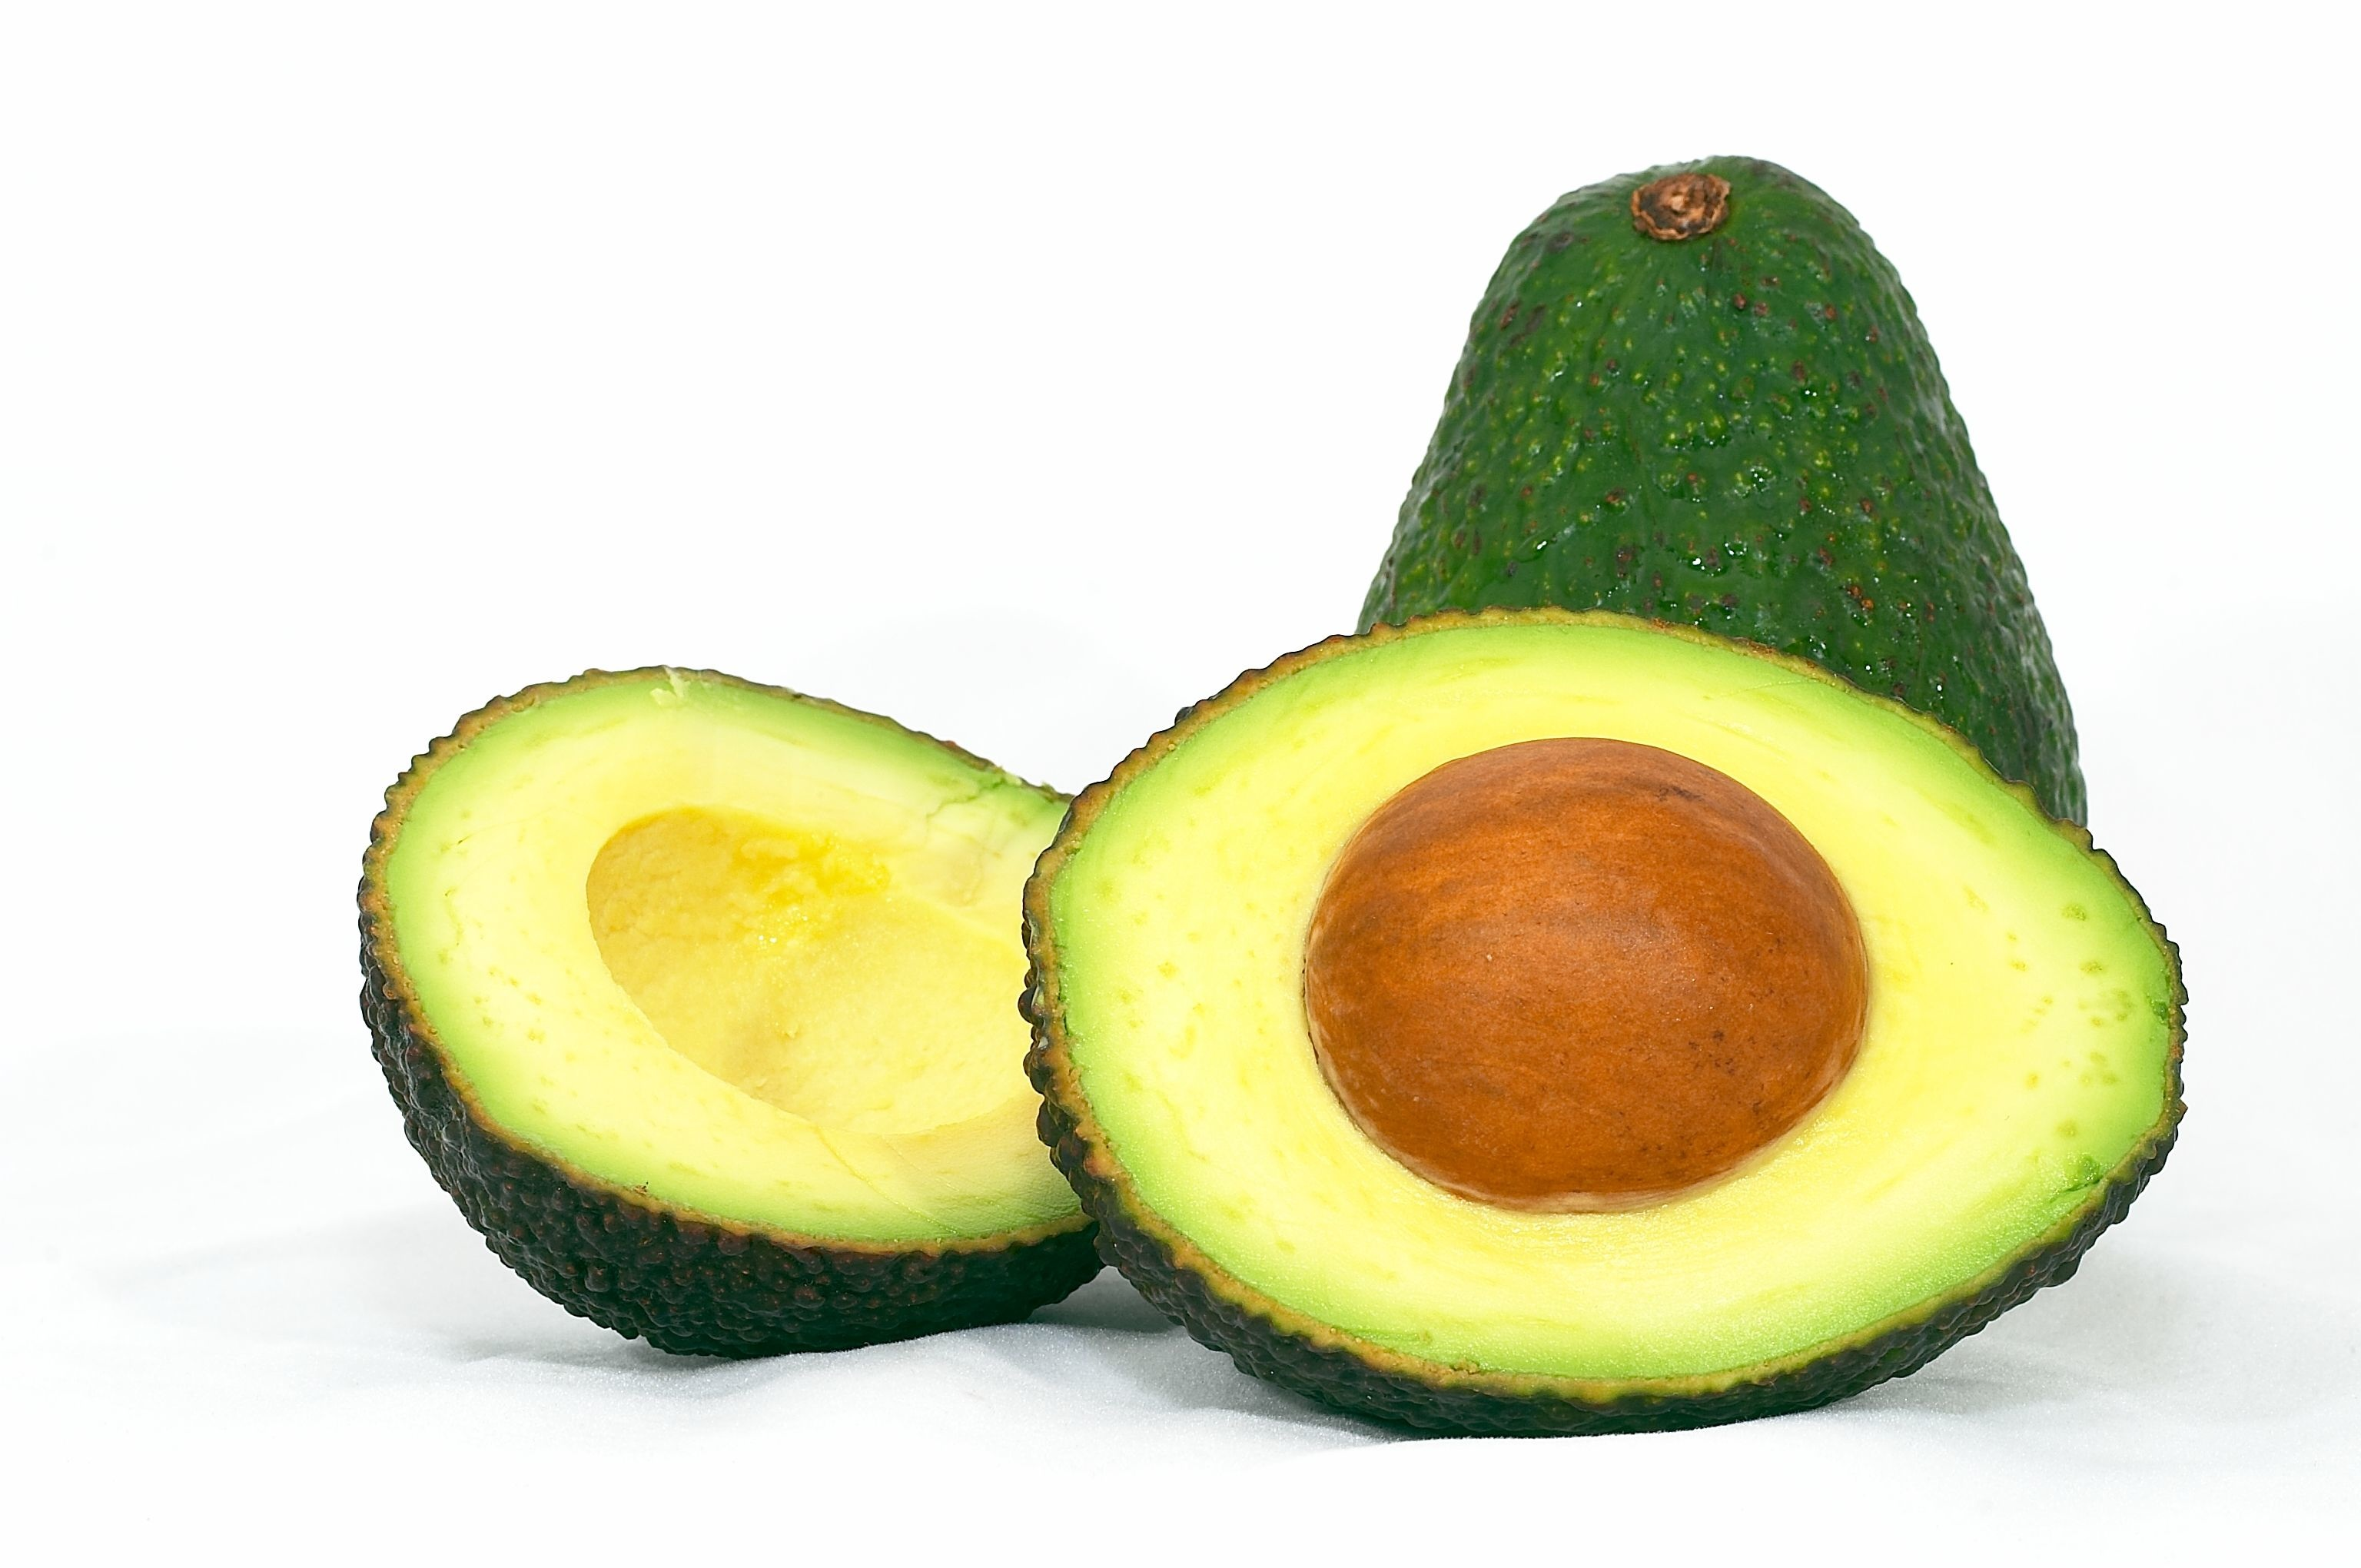 Авокадо в разрезе зеленого цвета